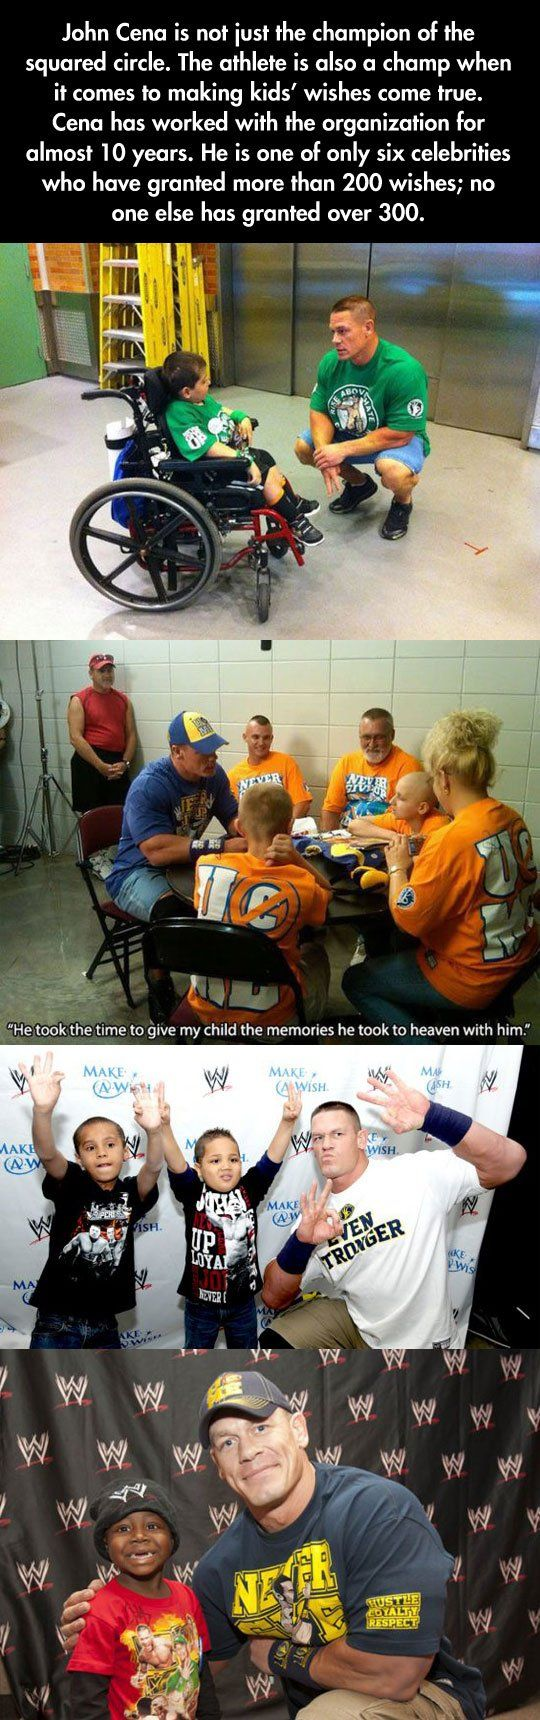 John Cena With Make-A-Wish Kids